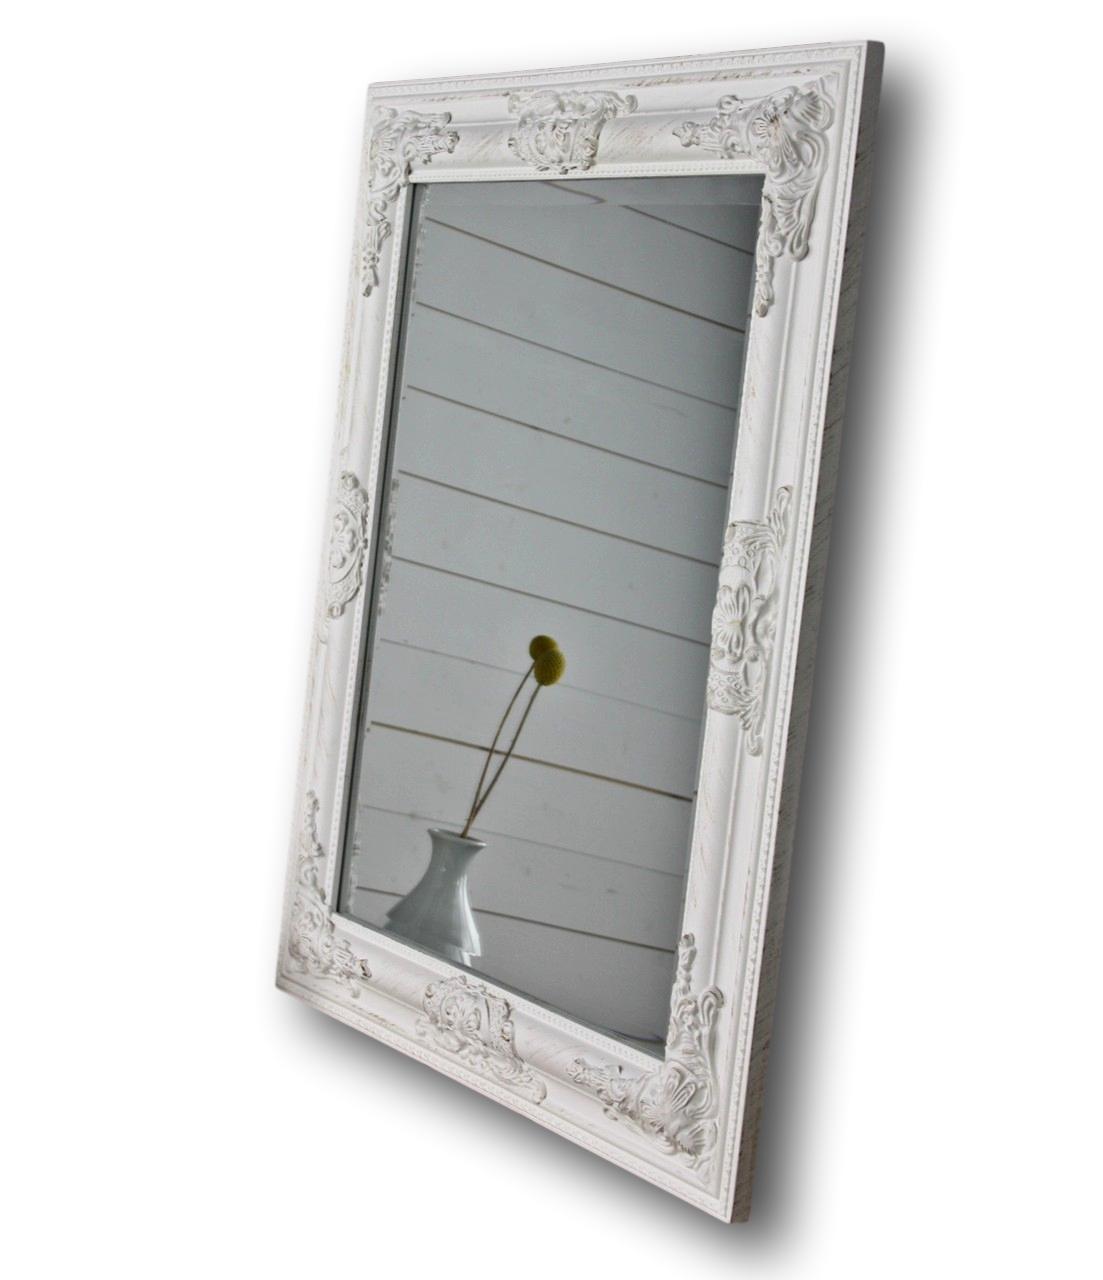 mirror 62x52 cm wall mirror baroque white wooden cottage. Black Bedroom Furniture Sets. Home Design Ideas